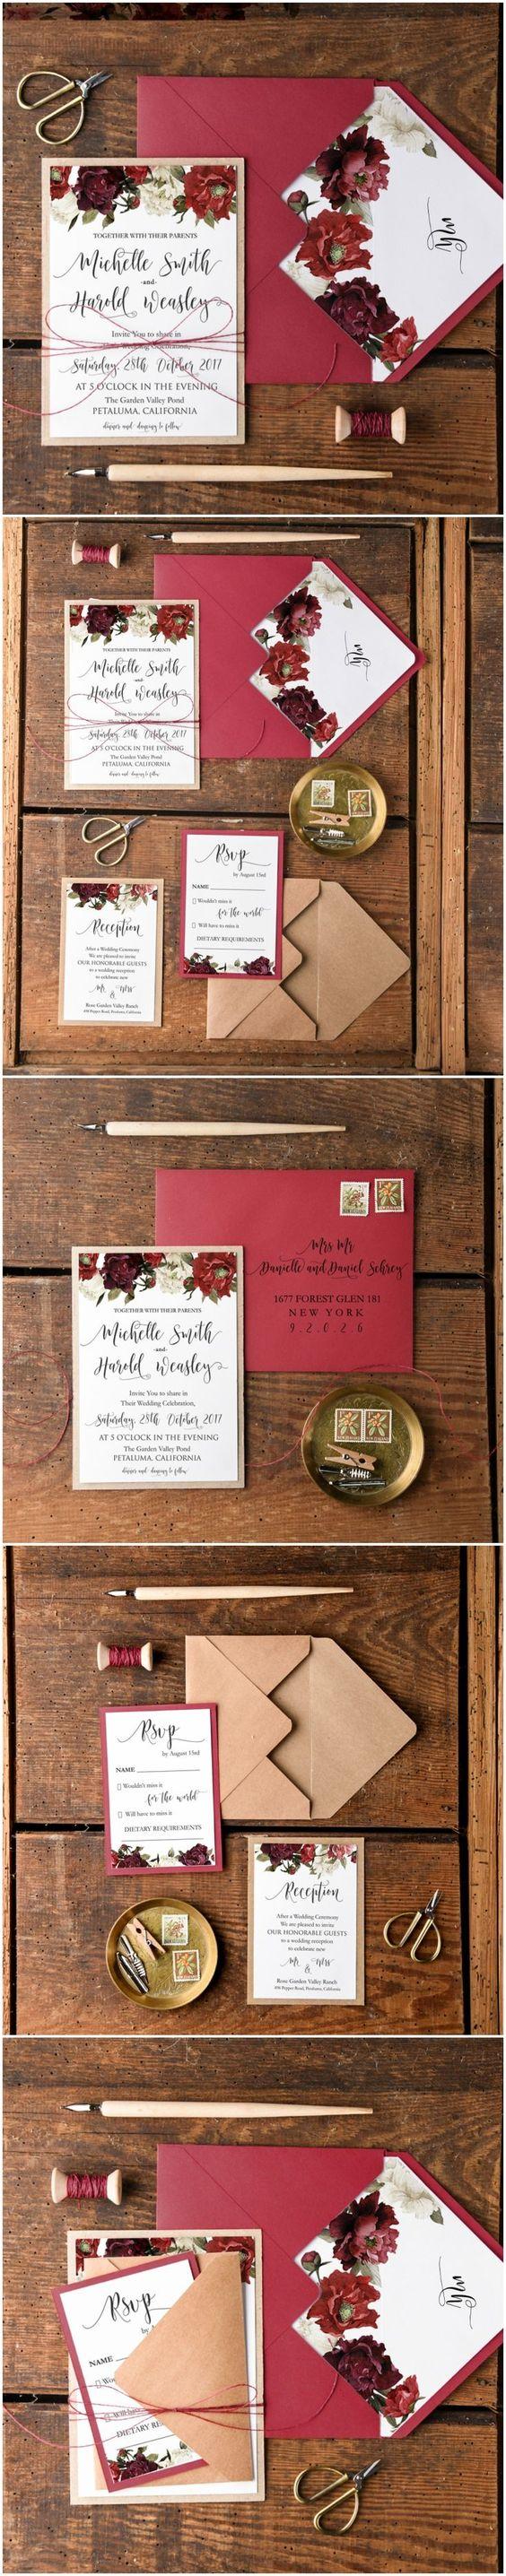 MELISSA GLITTER - Blush Laser Cut Wedding Invitation with Silver ...